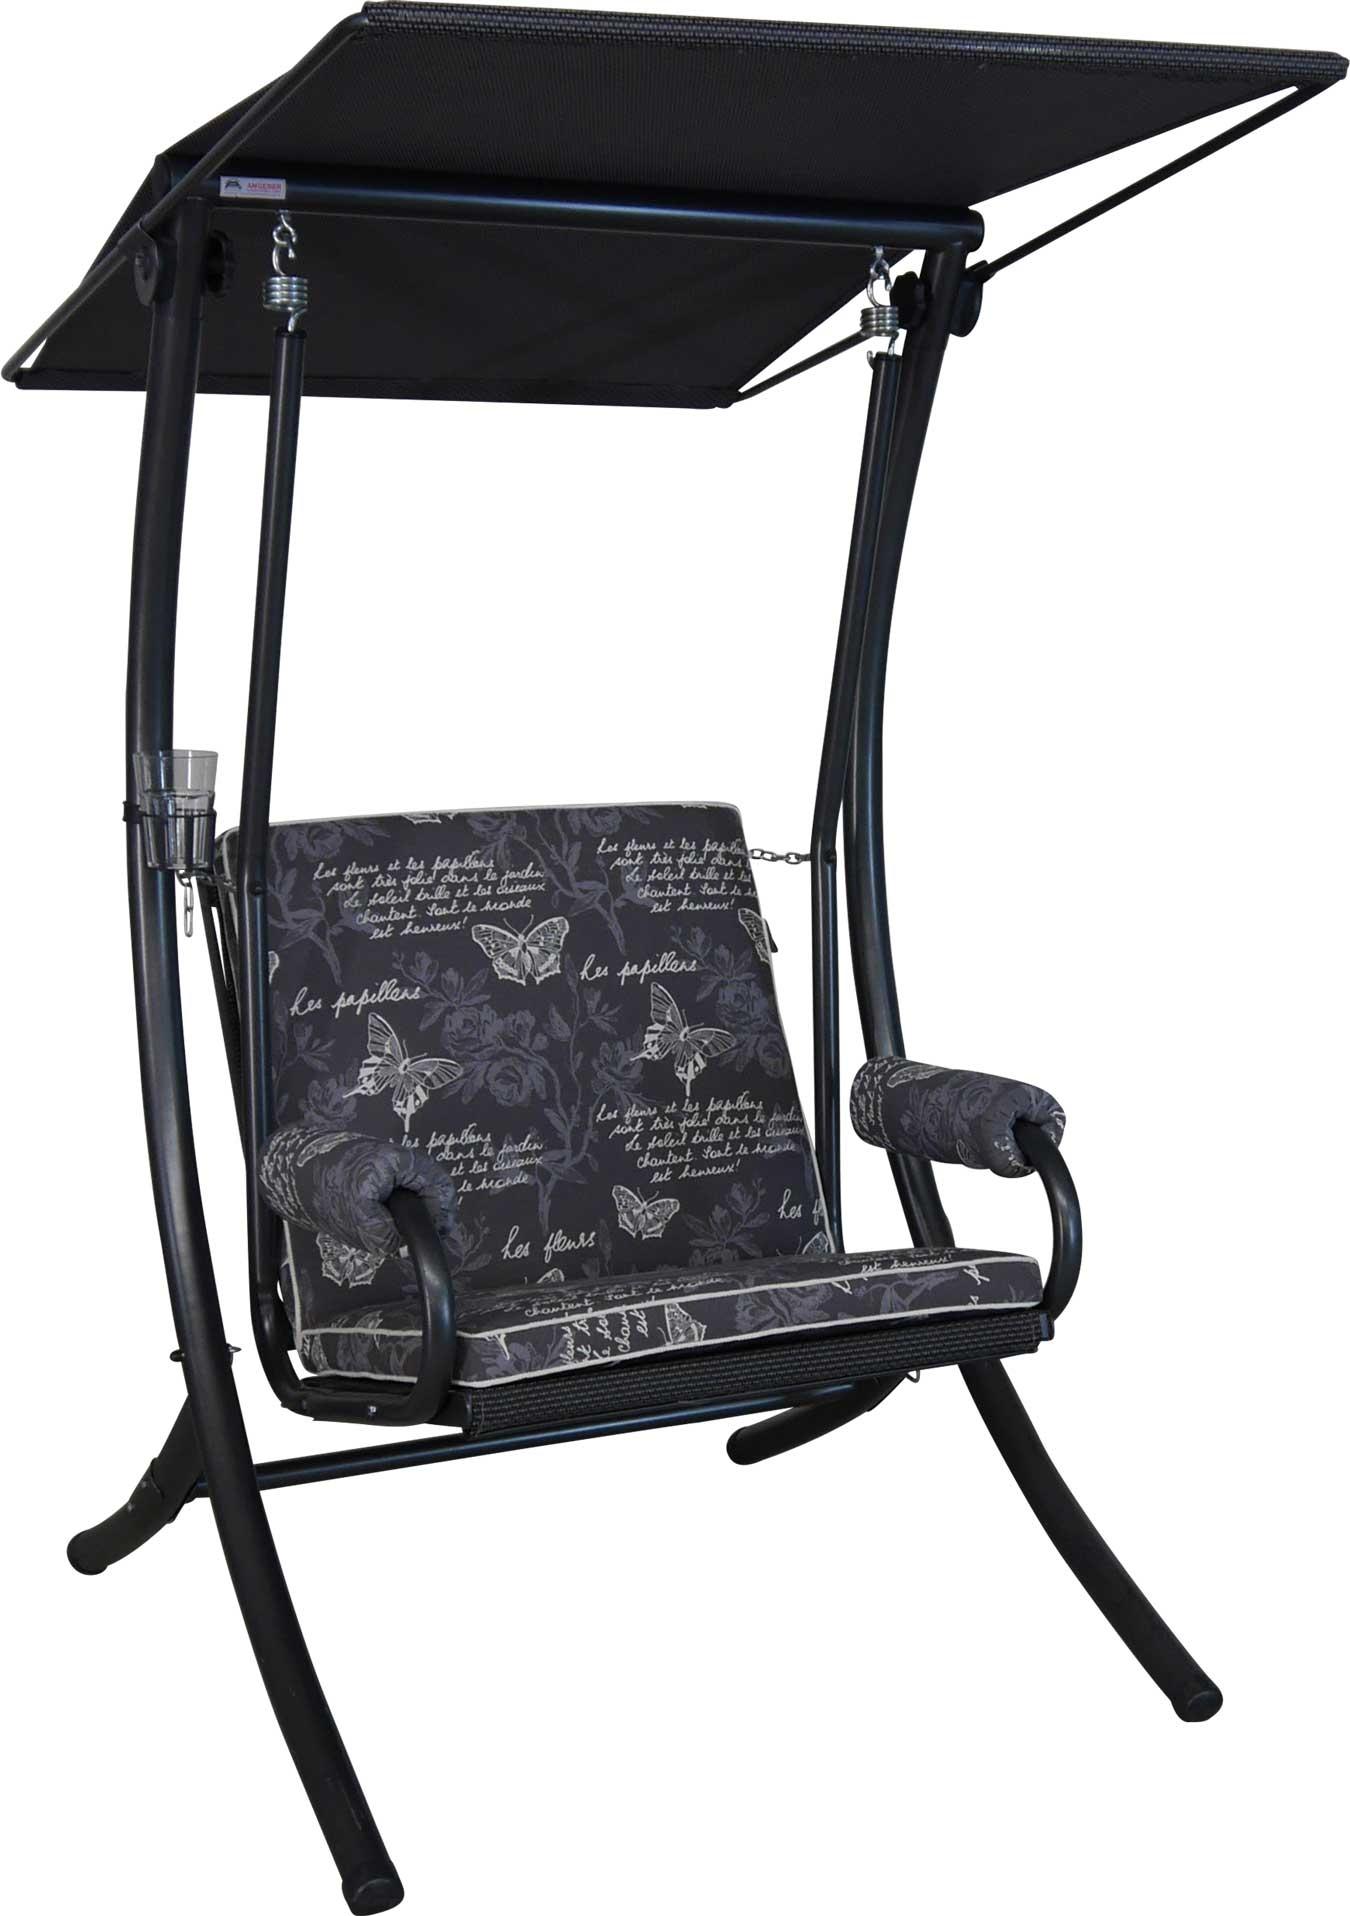 Angerer Hollyoodschaukel 1-Sitzer Royal Schmetterling